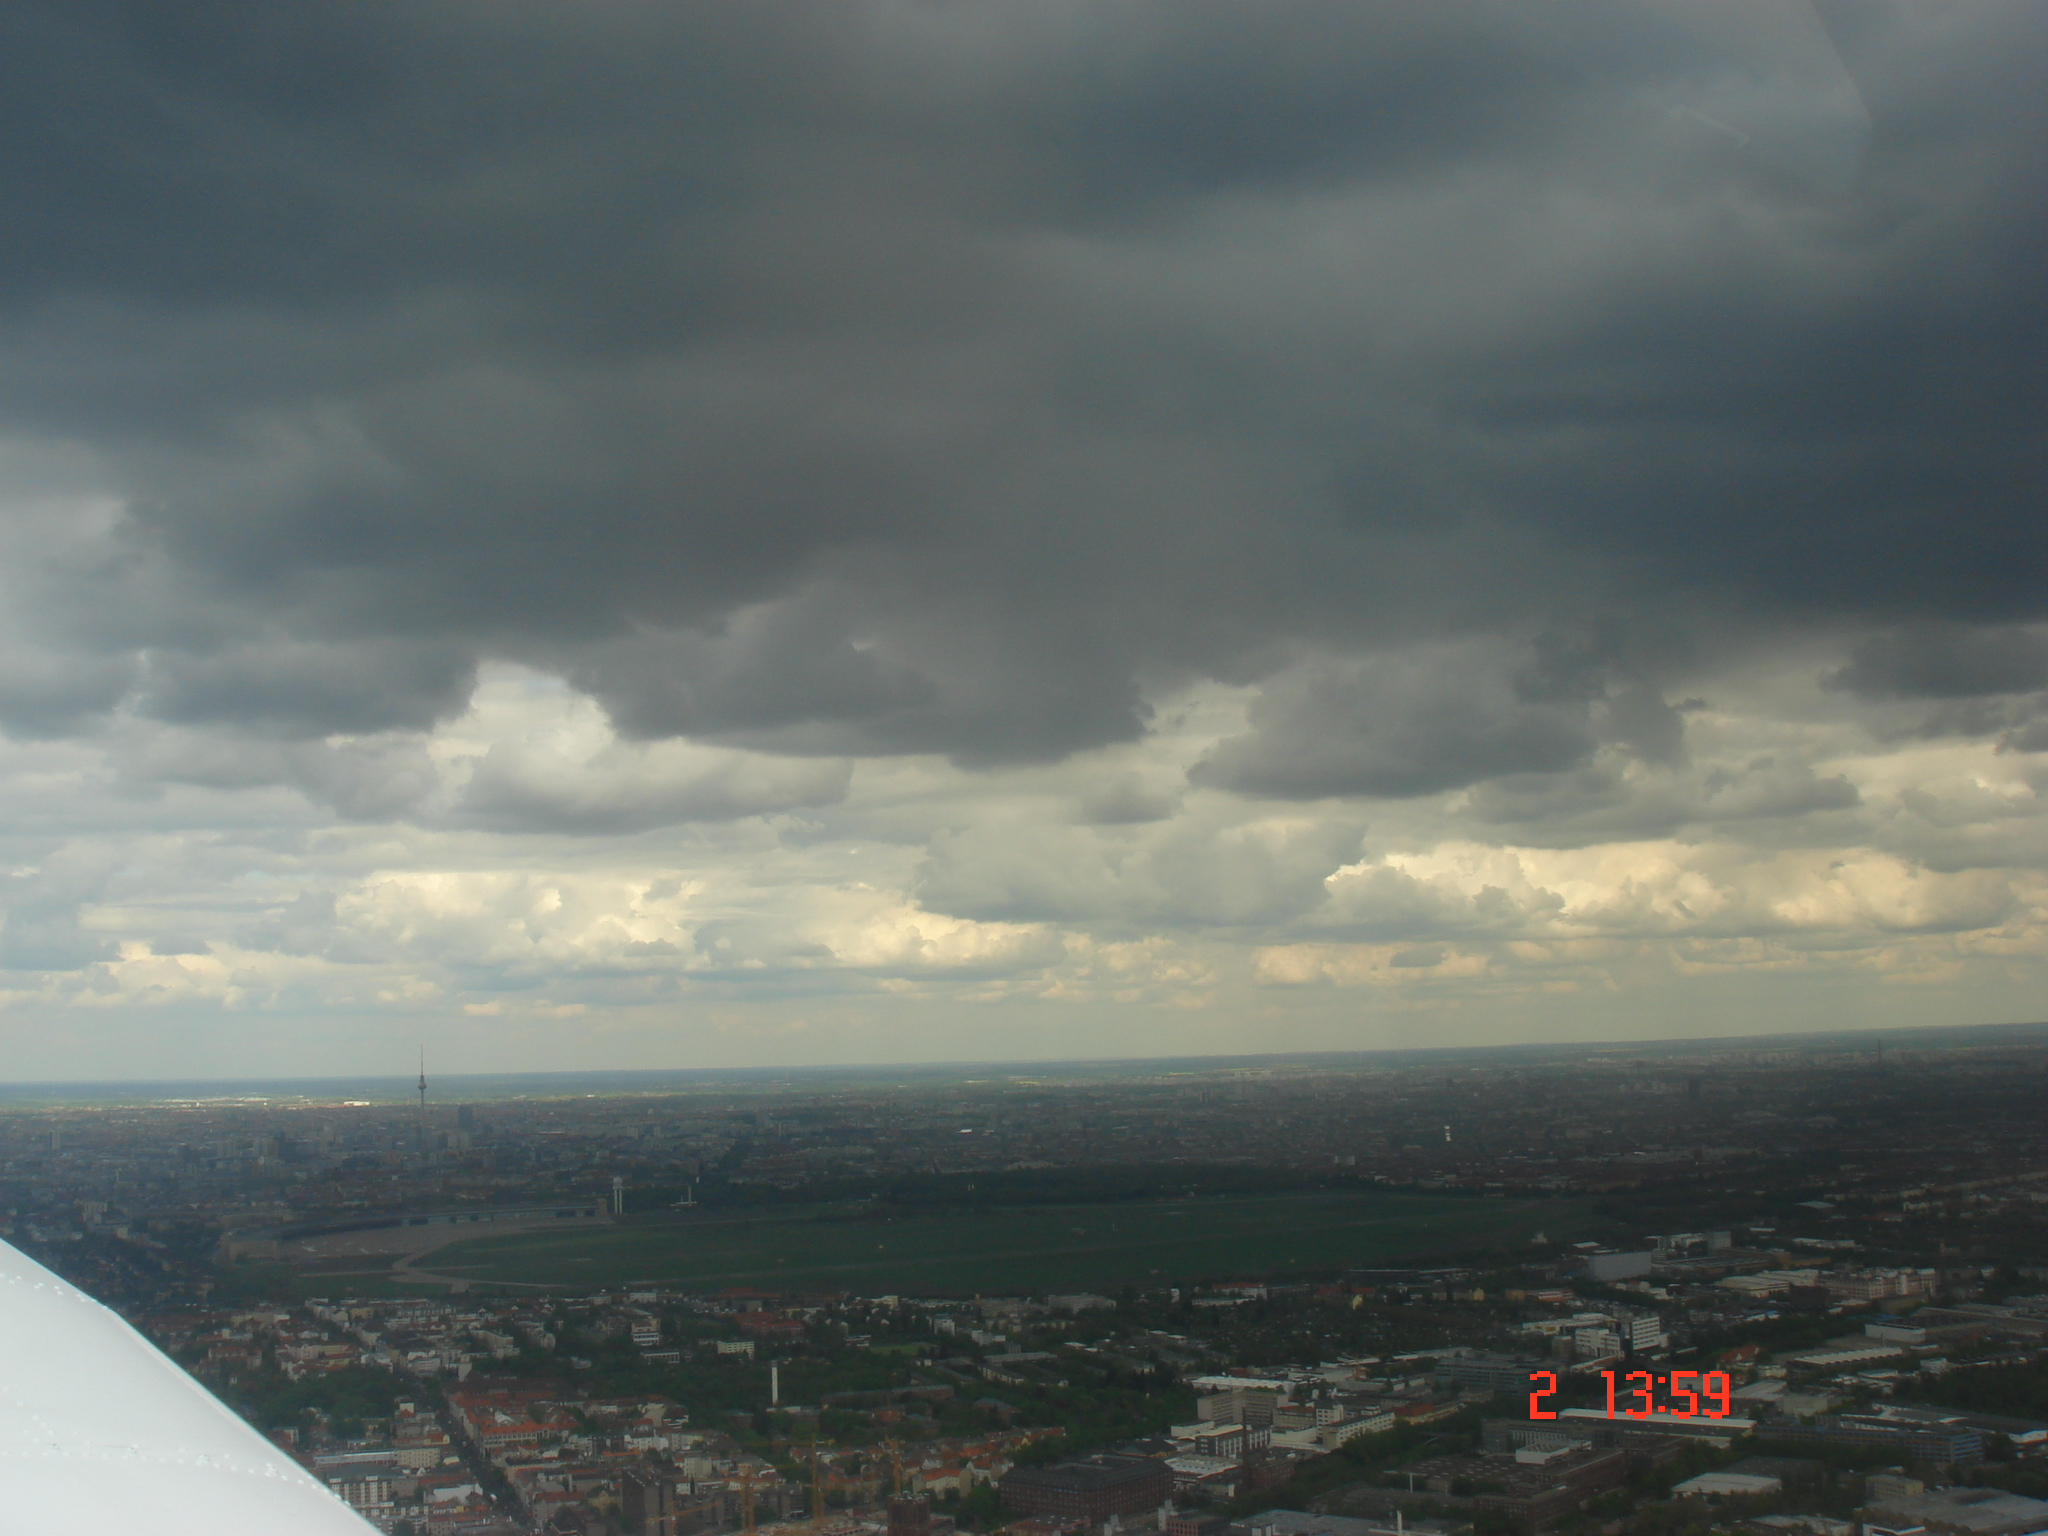 Le ciel est menaçant à l'arrivée à Tempelhof (EDDI)